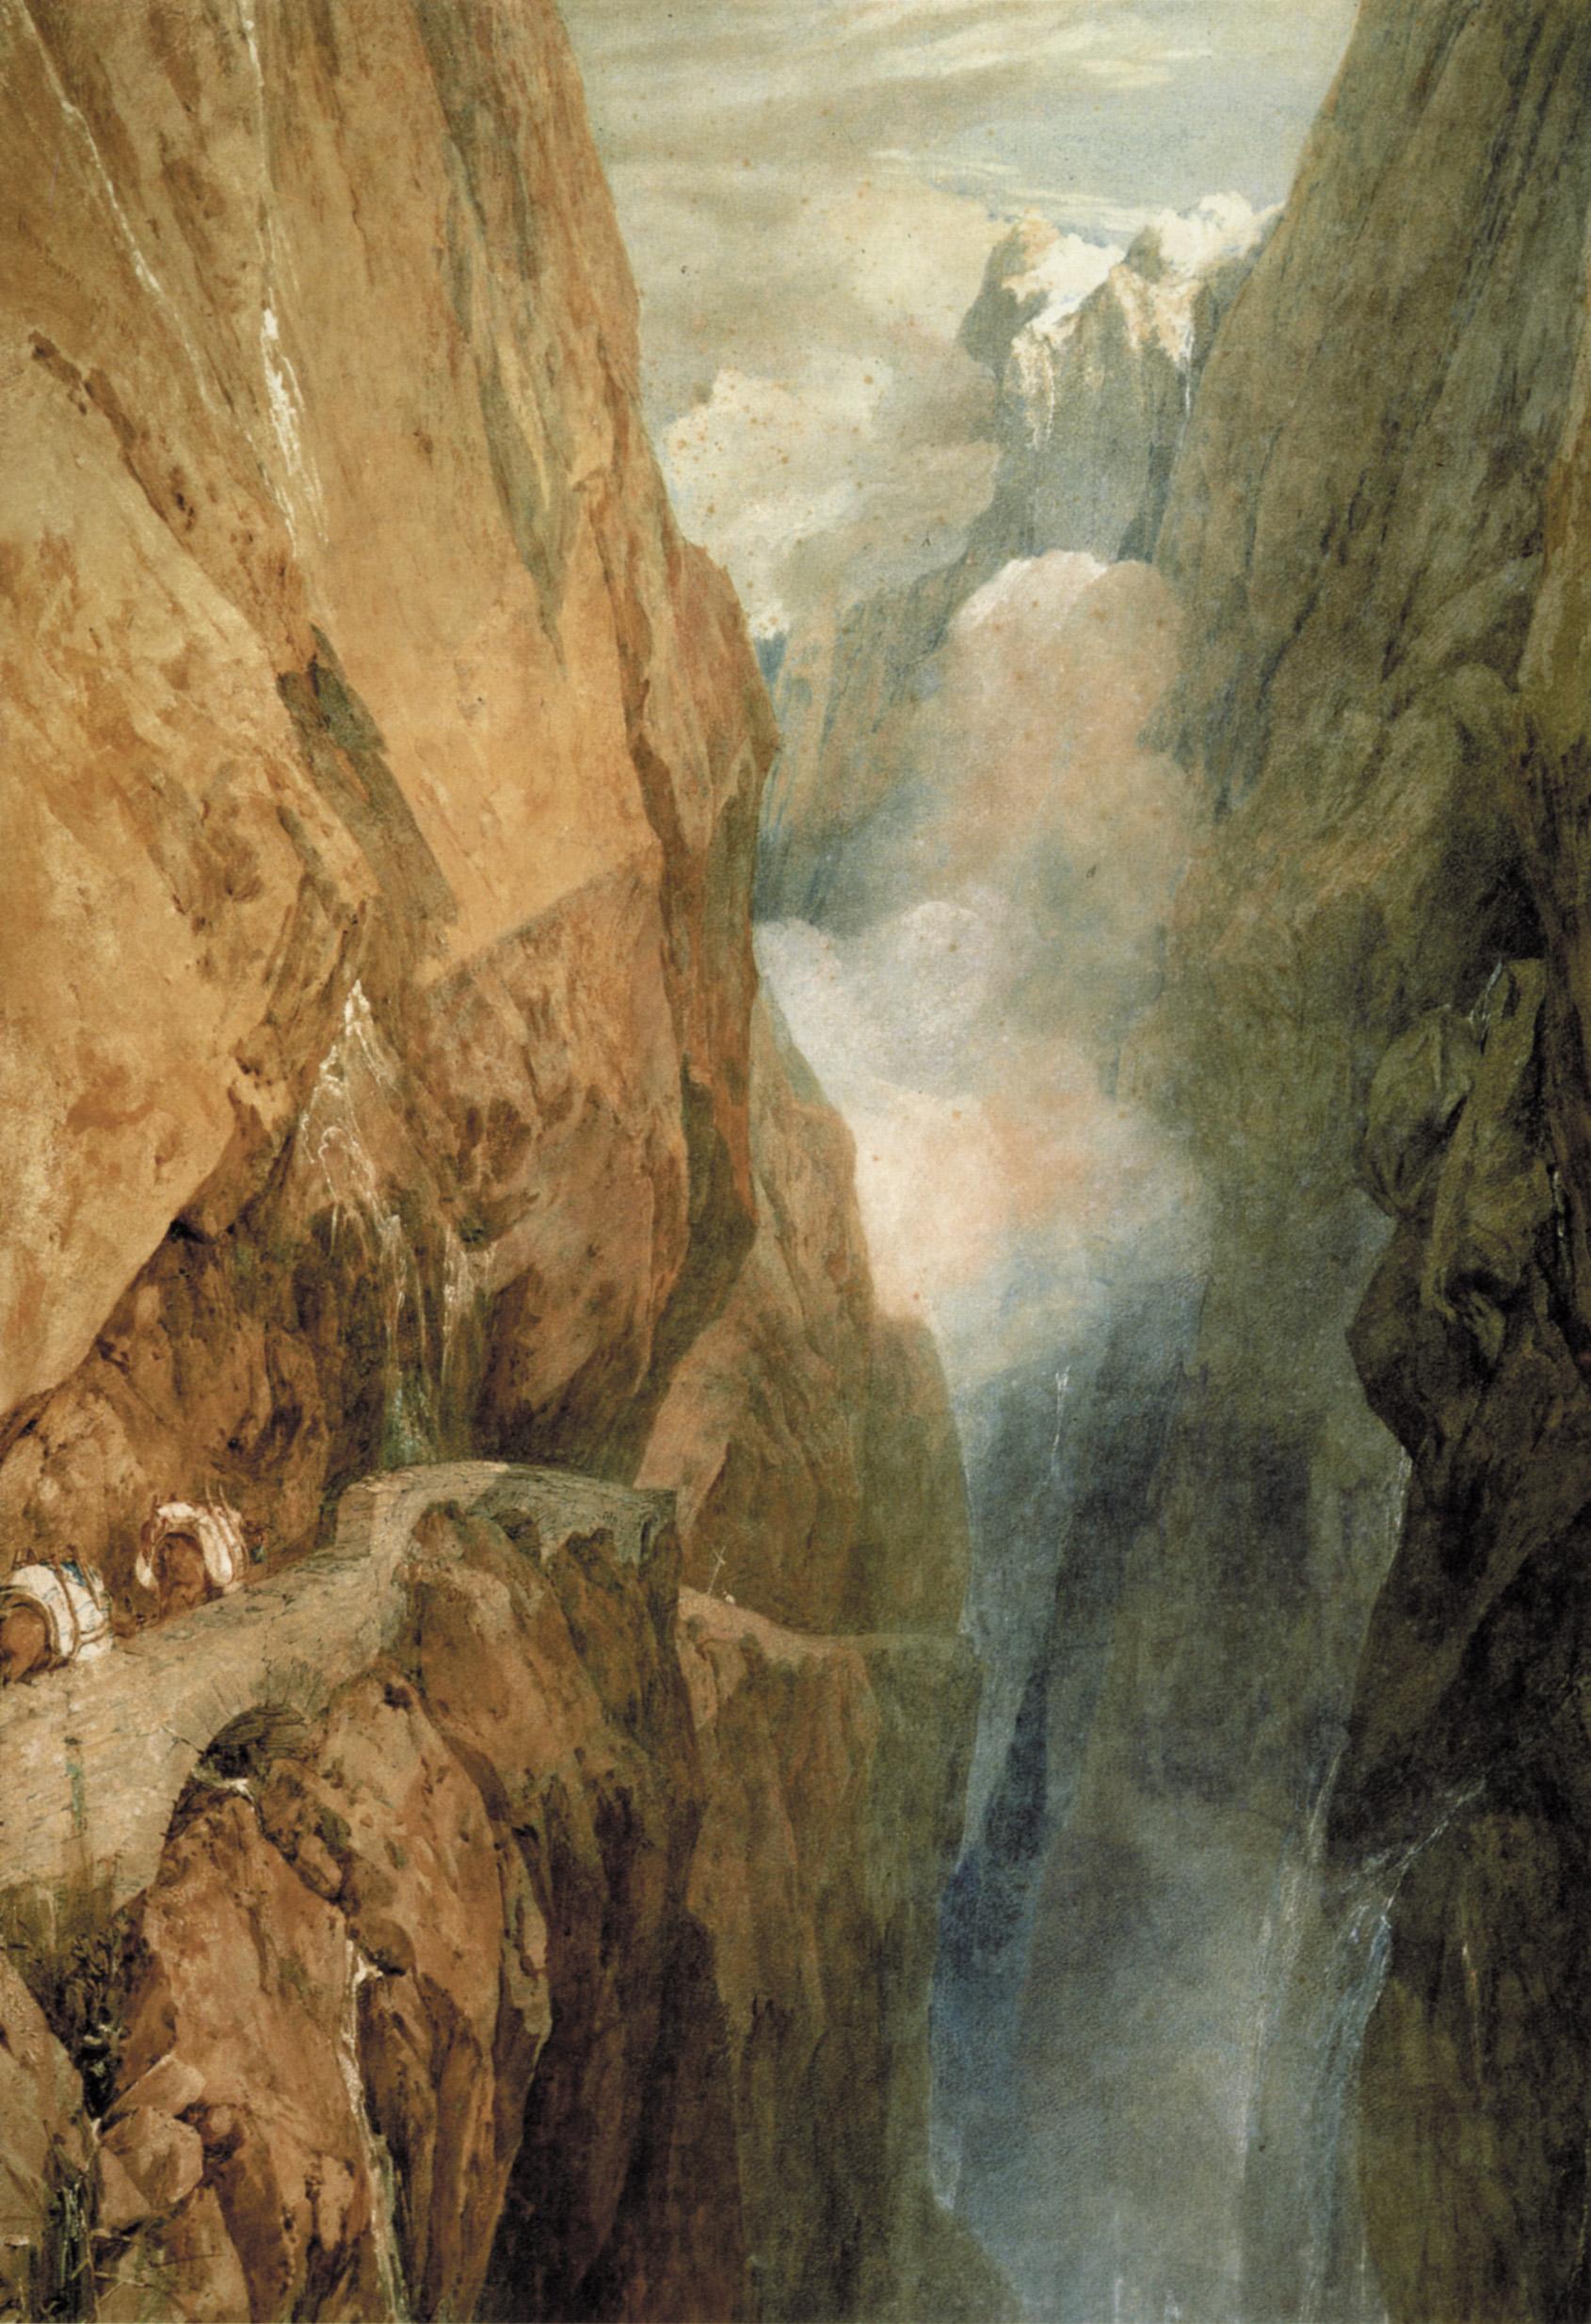 картина Дорога святого Готхарда :: Уильям Тёрнер - William Turner фото